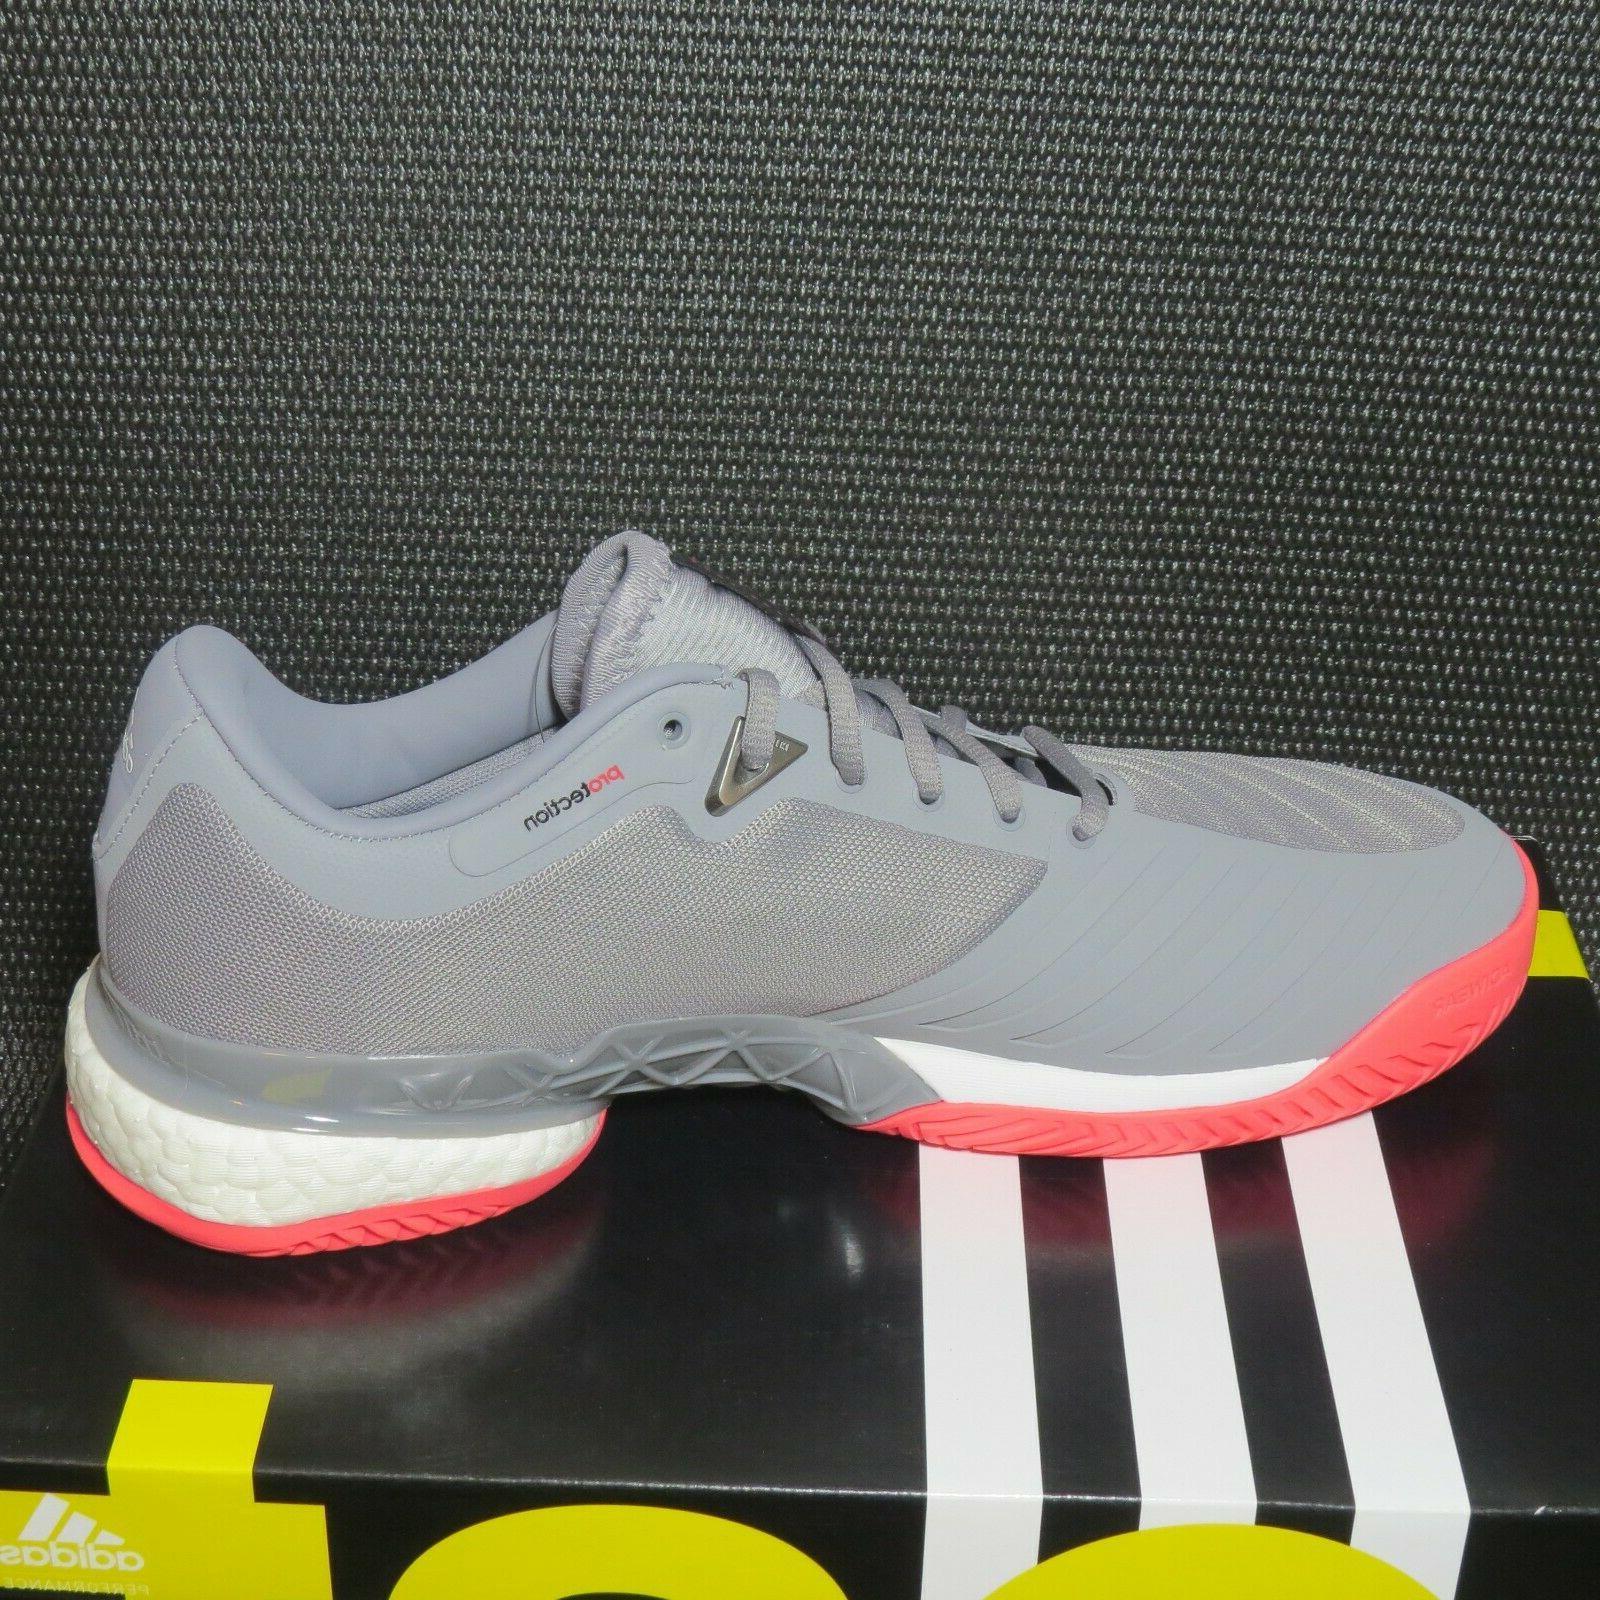 adidas AH2094 Tennis Shoes Grey/White/Pink NIB